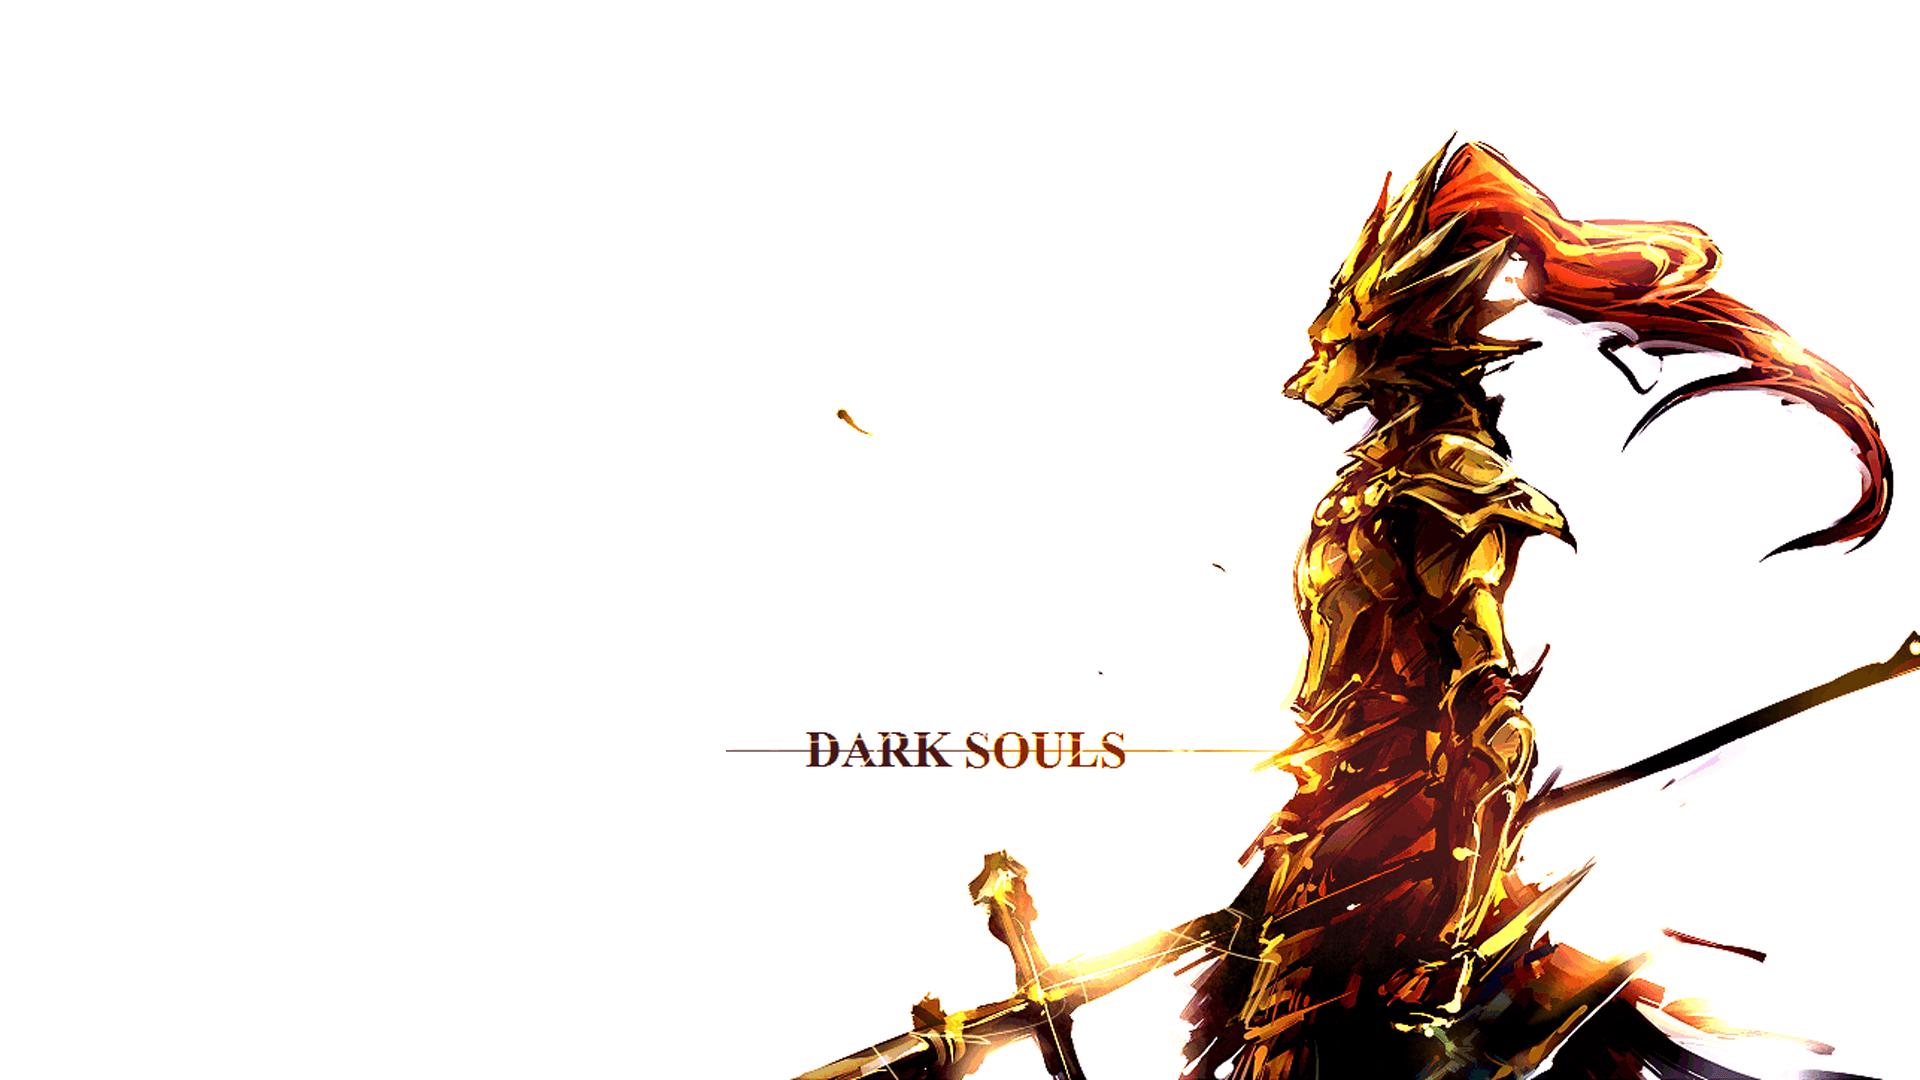 dark souls 3 wallpaper 1080p - photo #27